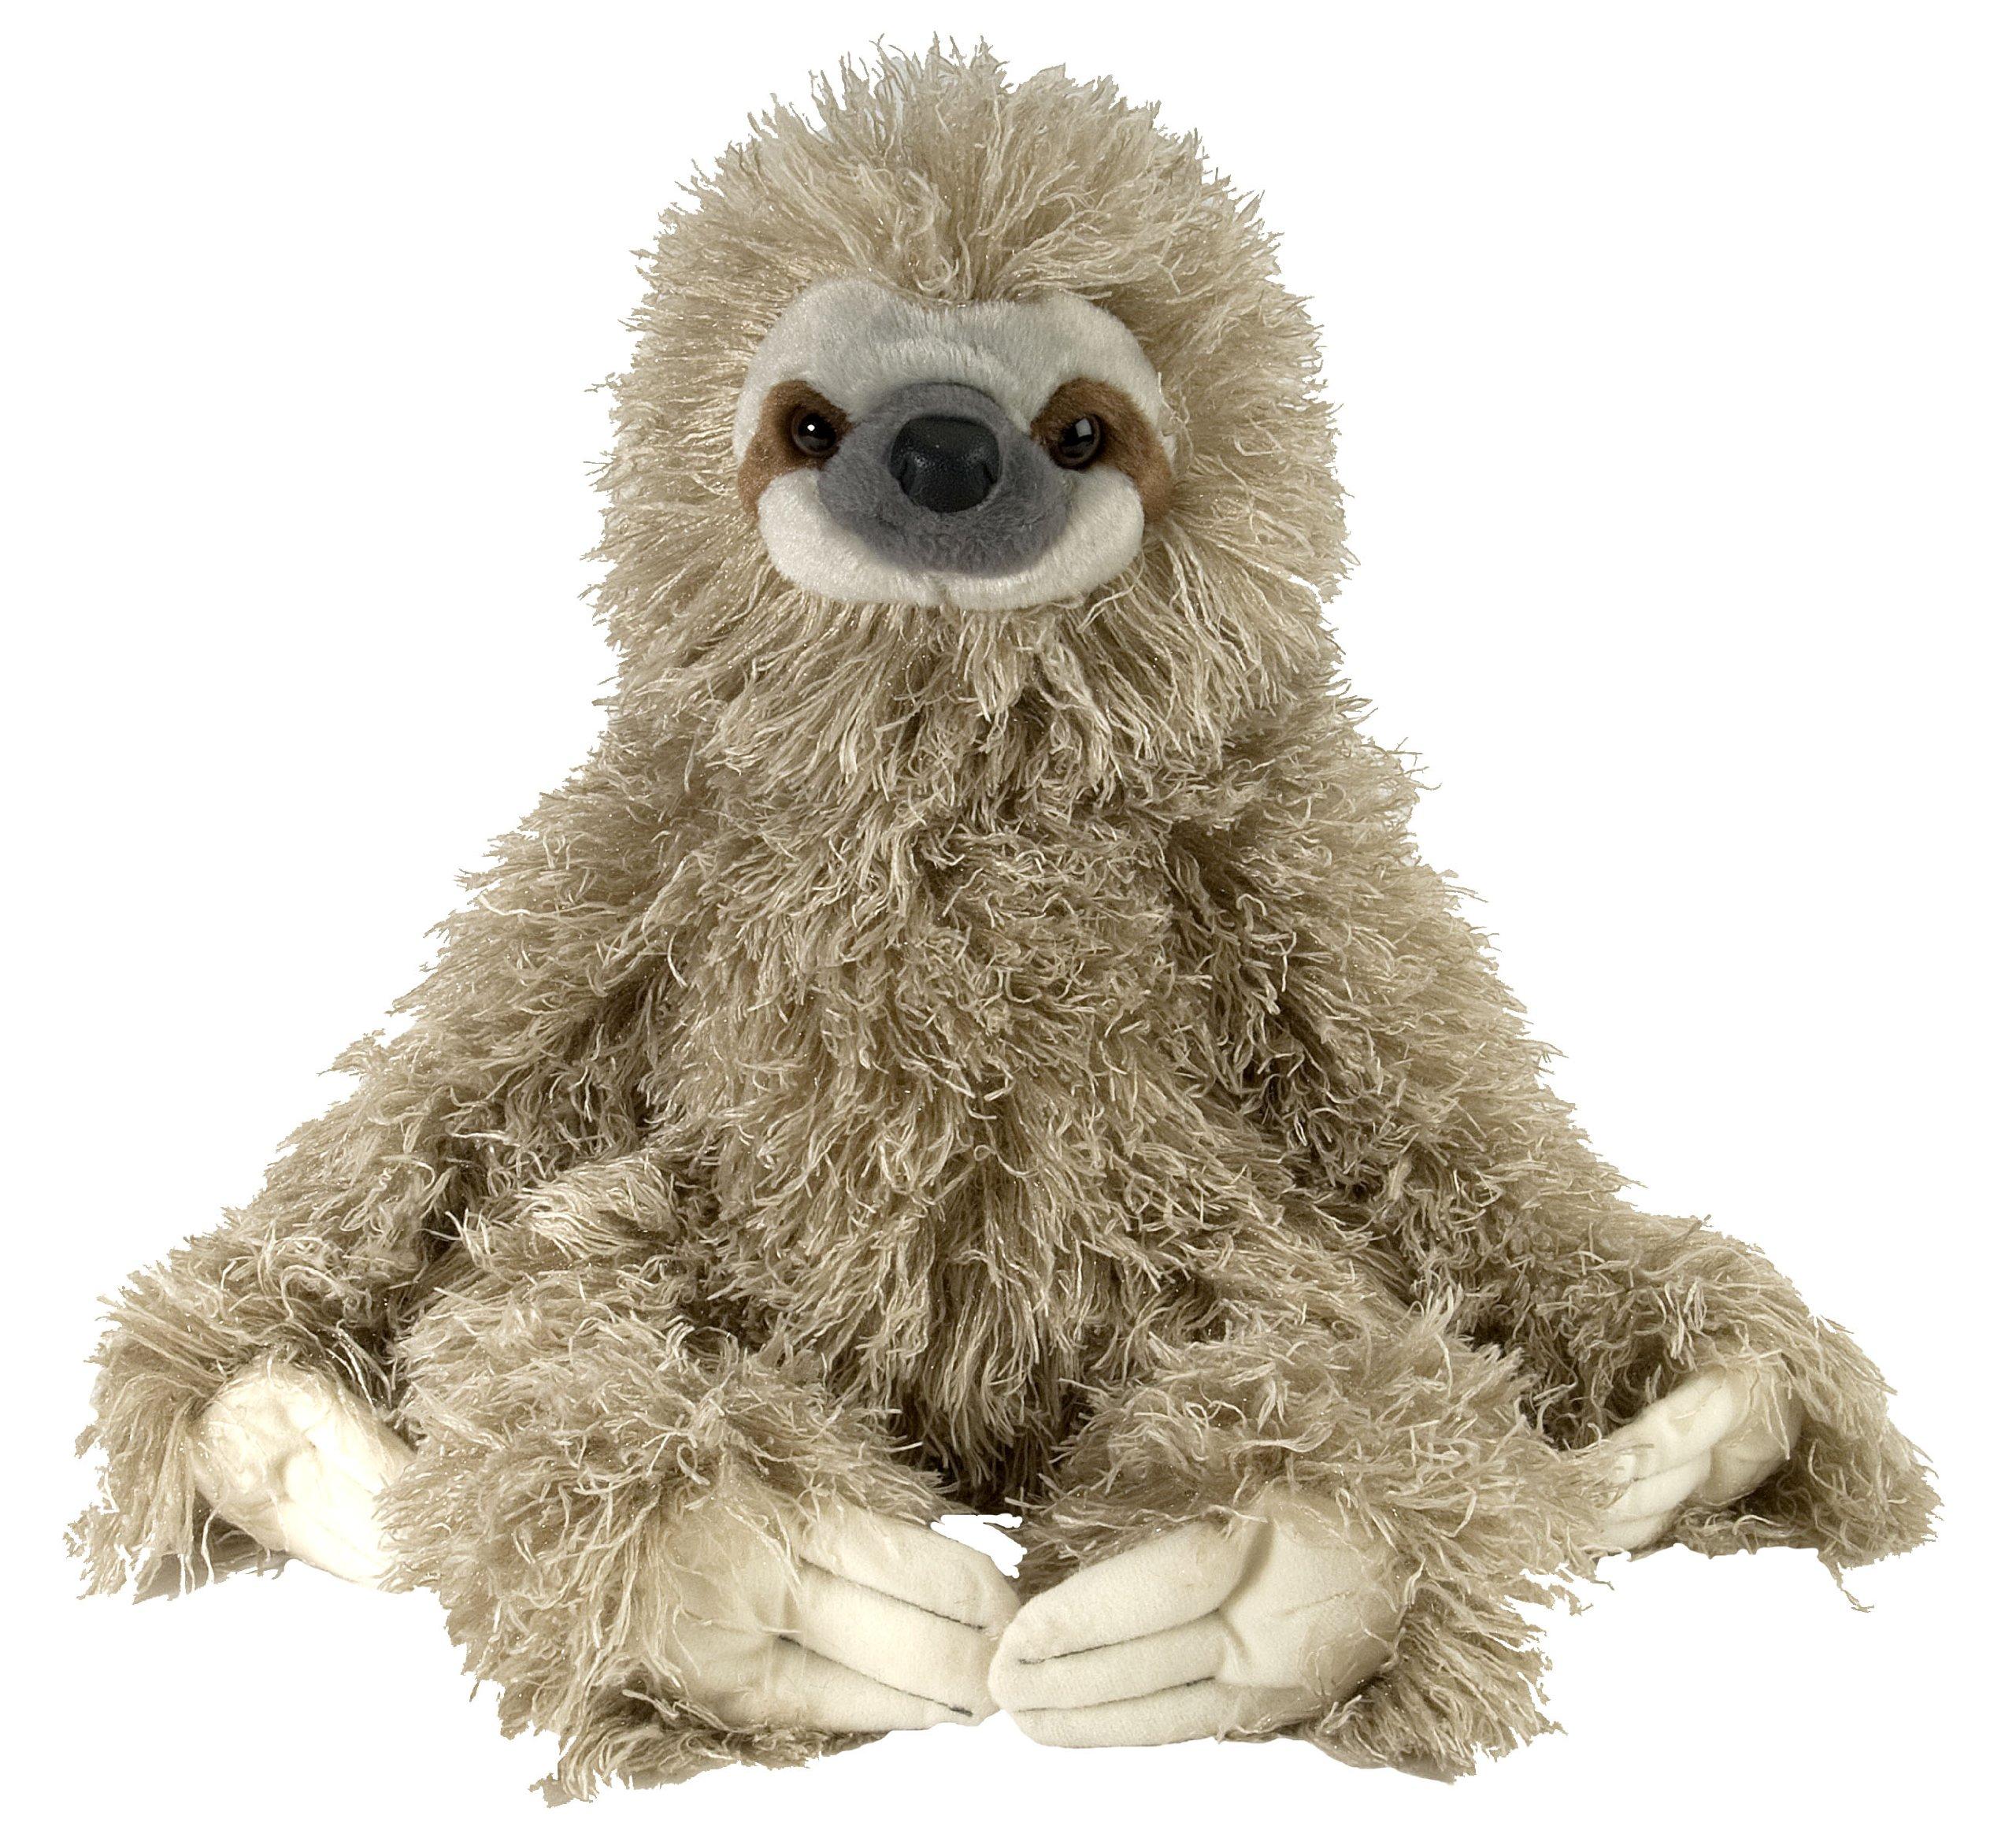 Wild Republic Three Toed Sloth Plush, Stuffed Animal, Plush Toy, Gifts for Kids, Cuddlekins 12 Inches